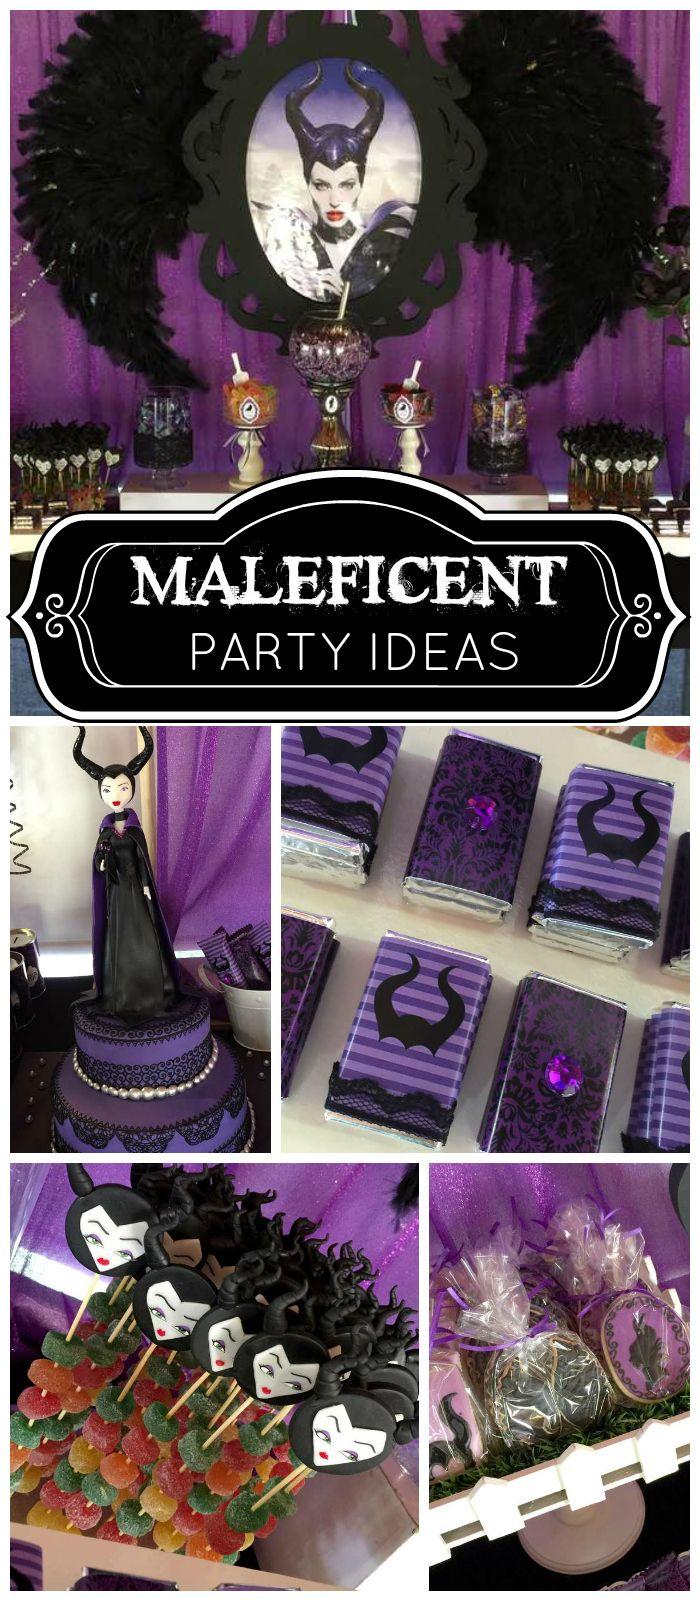 M 225 s de 1000 ideas sobre decoraciones de fiesta de safari en pinterest - A Glamorous Purple And Black Maleficent Girl Birthday Party With A Stunning Cake See More